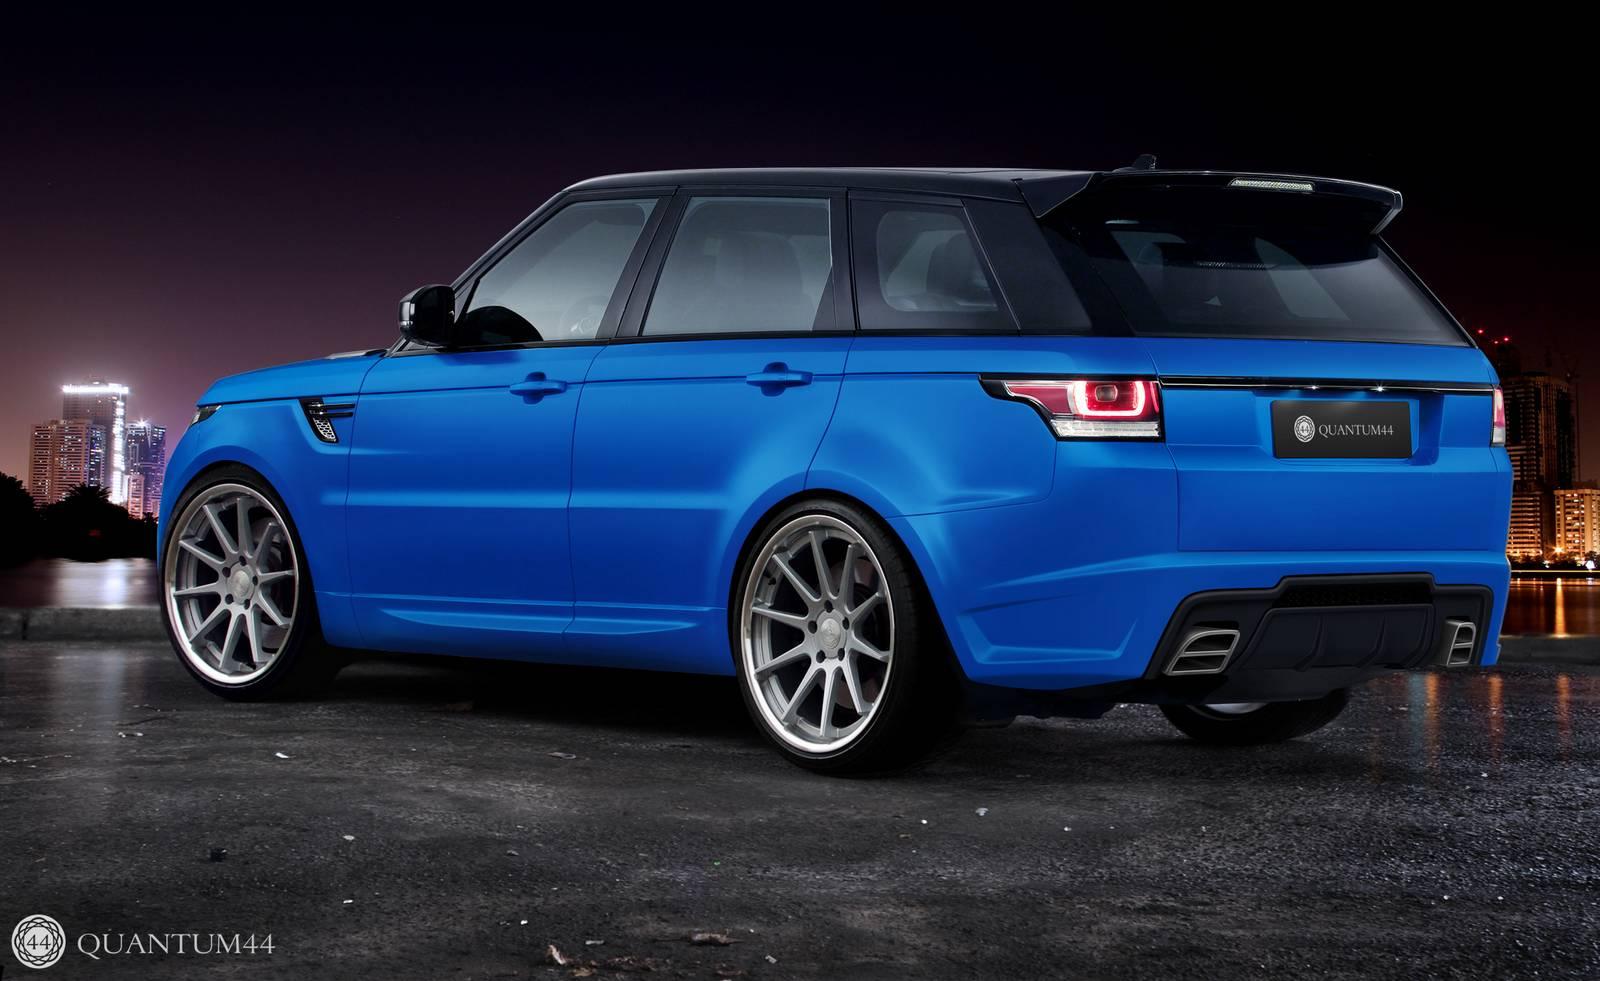 http://www.gtspirit.com/wp-content/uploads/2014/02/front-BLUE-range-rover-SPORT-rear.jpg